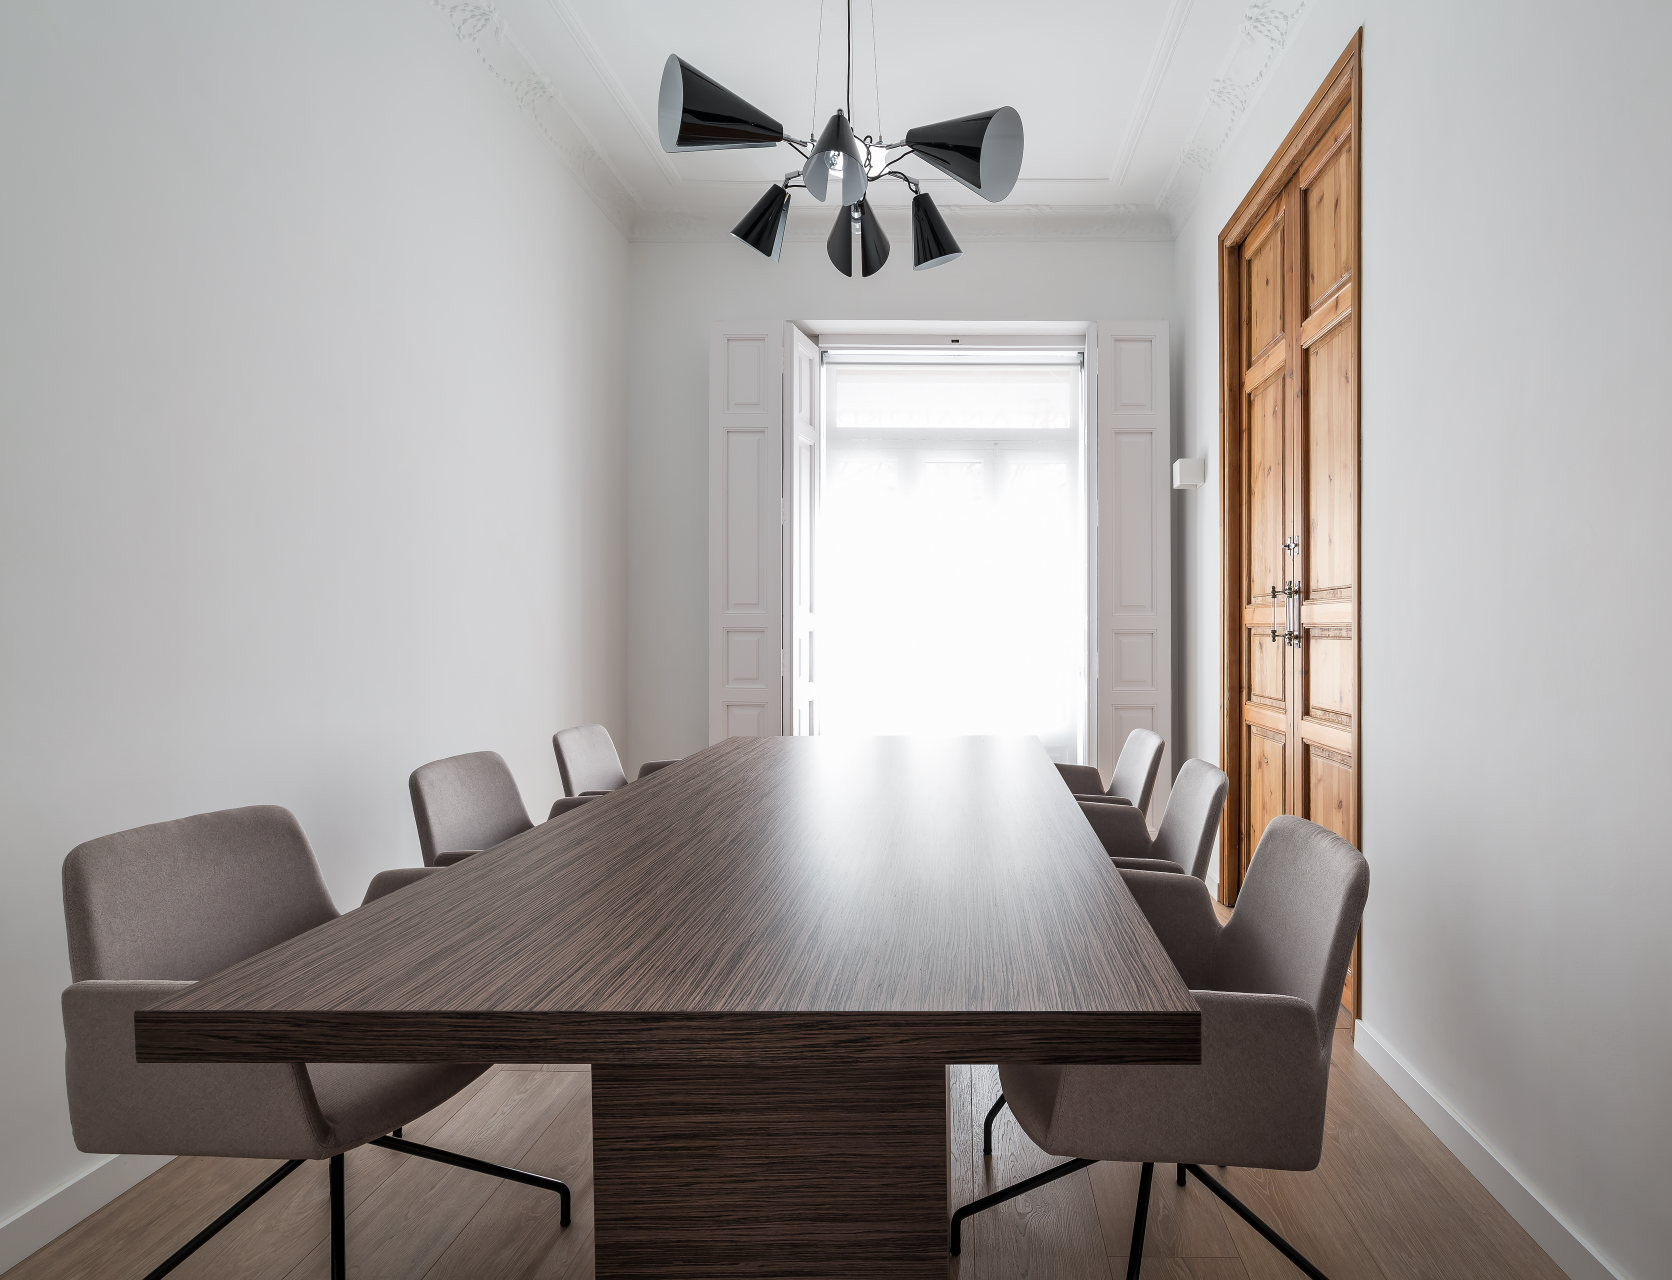 fotografia-arquitectura-valencia-german-cabo-d'estudio-despacho-oficinas-anaford-abogados (3)